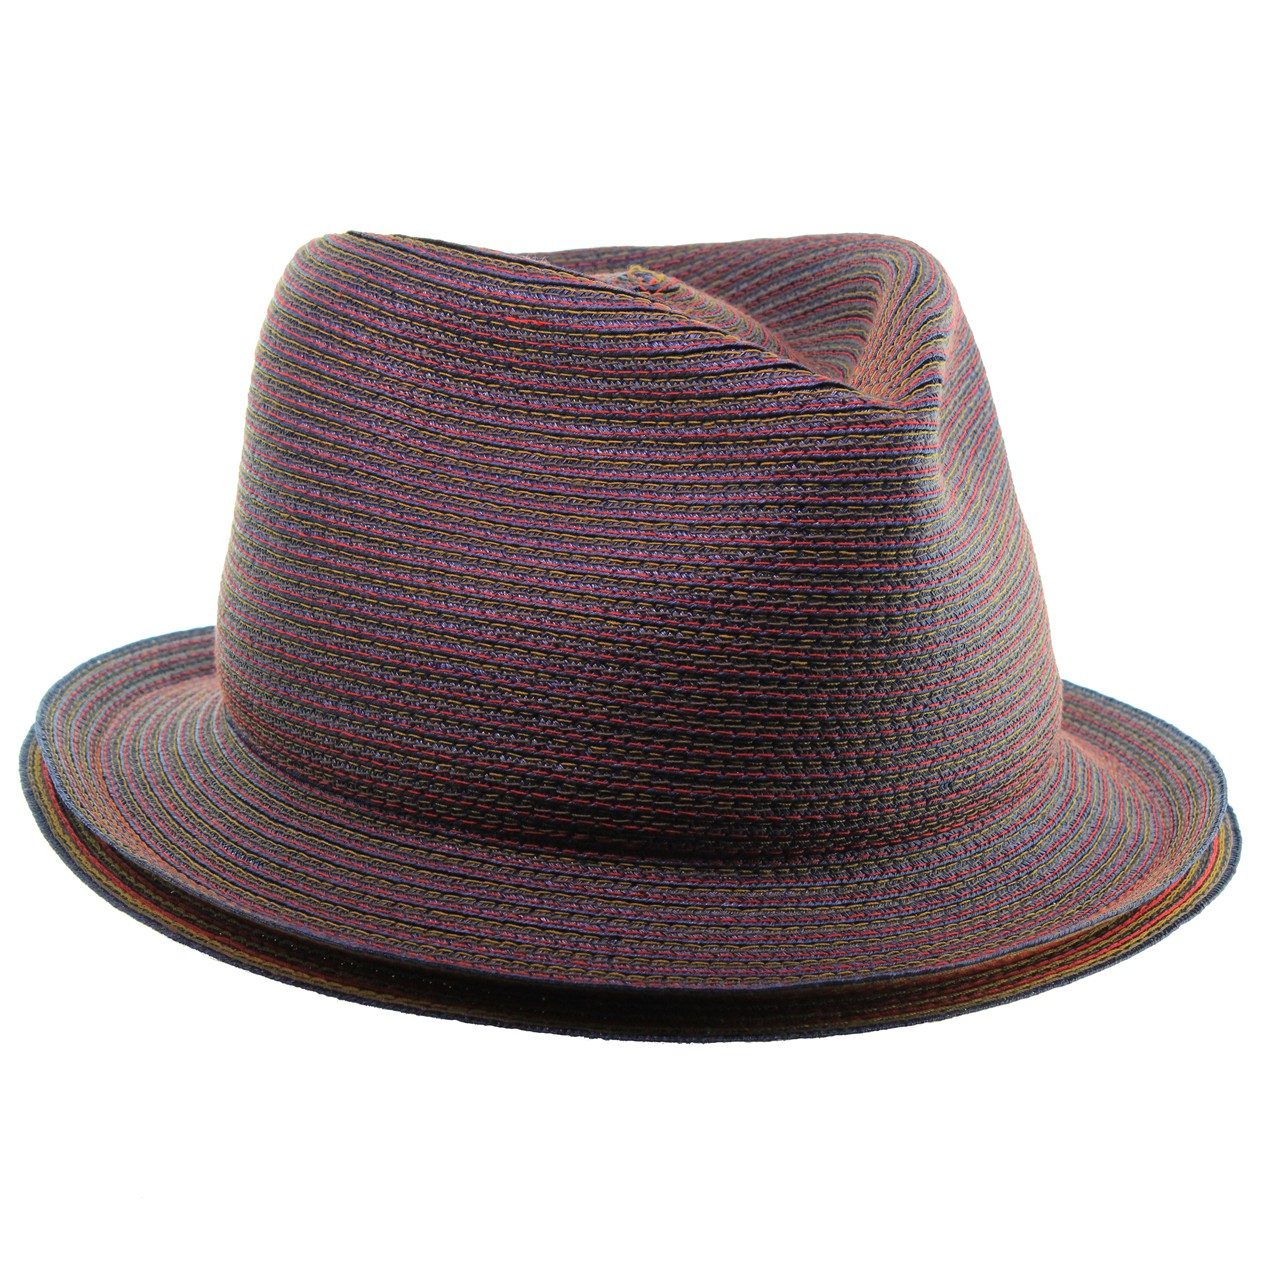 Signature Straw Hats - JenniferOuellette 9e01c3f1f698